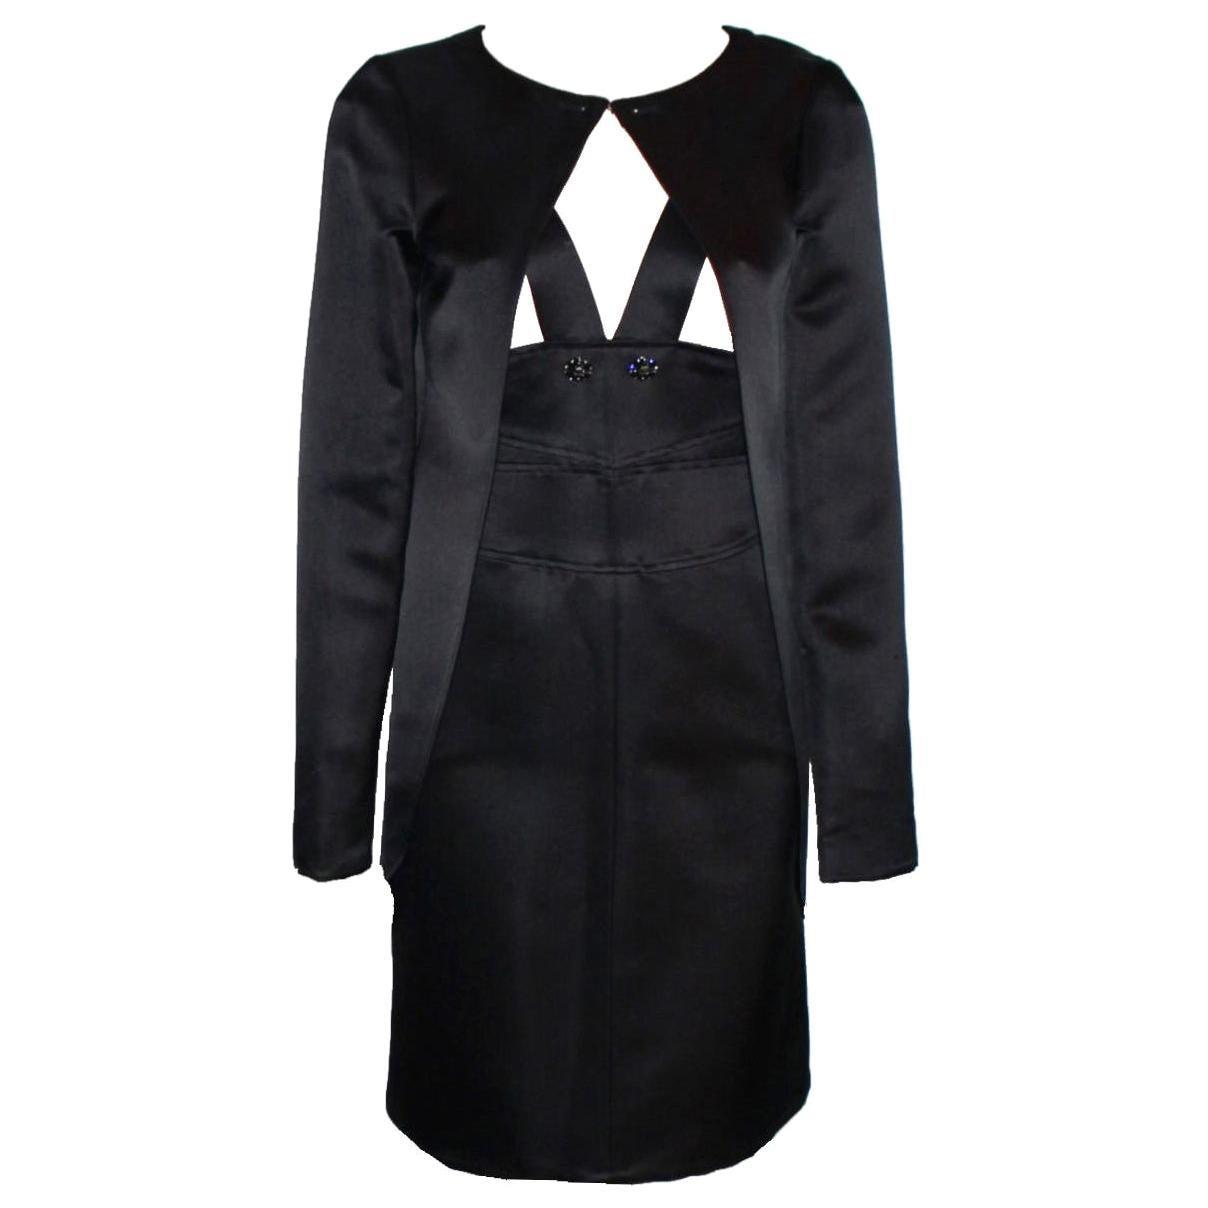 NEW Chanel Black Silk Dress Jewelled Buttons & Jacket Coat Suit Ensemble Outfit